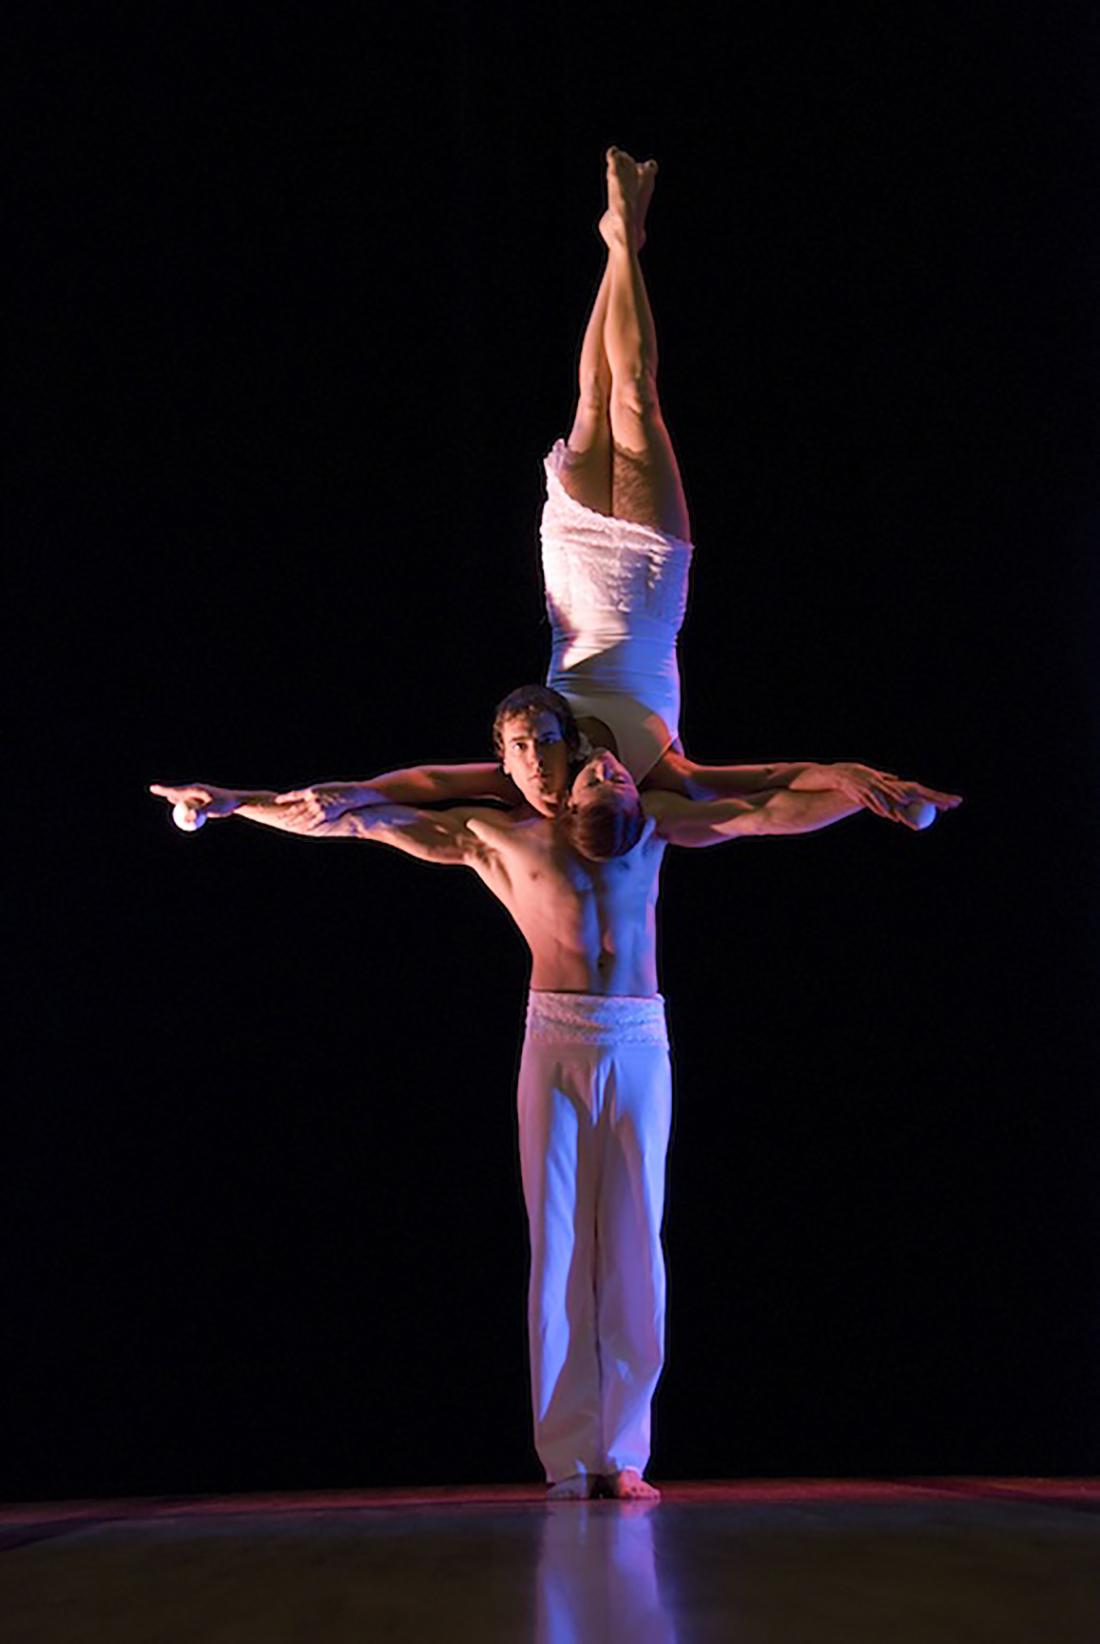 White trousers & acrobatic dress